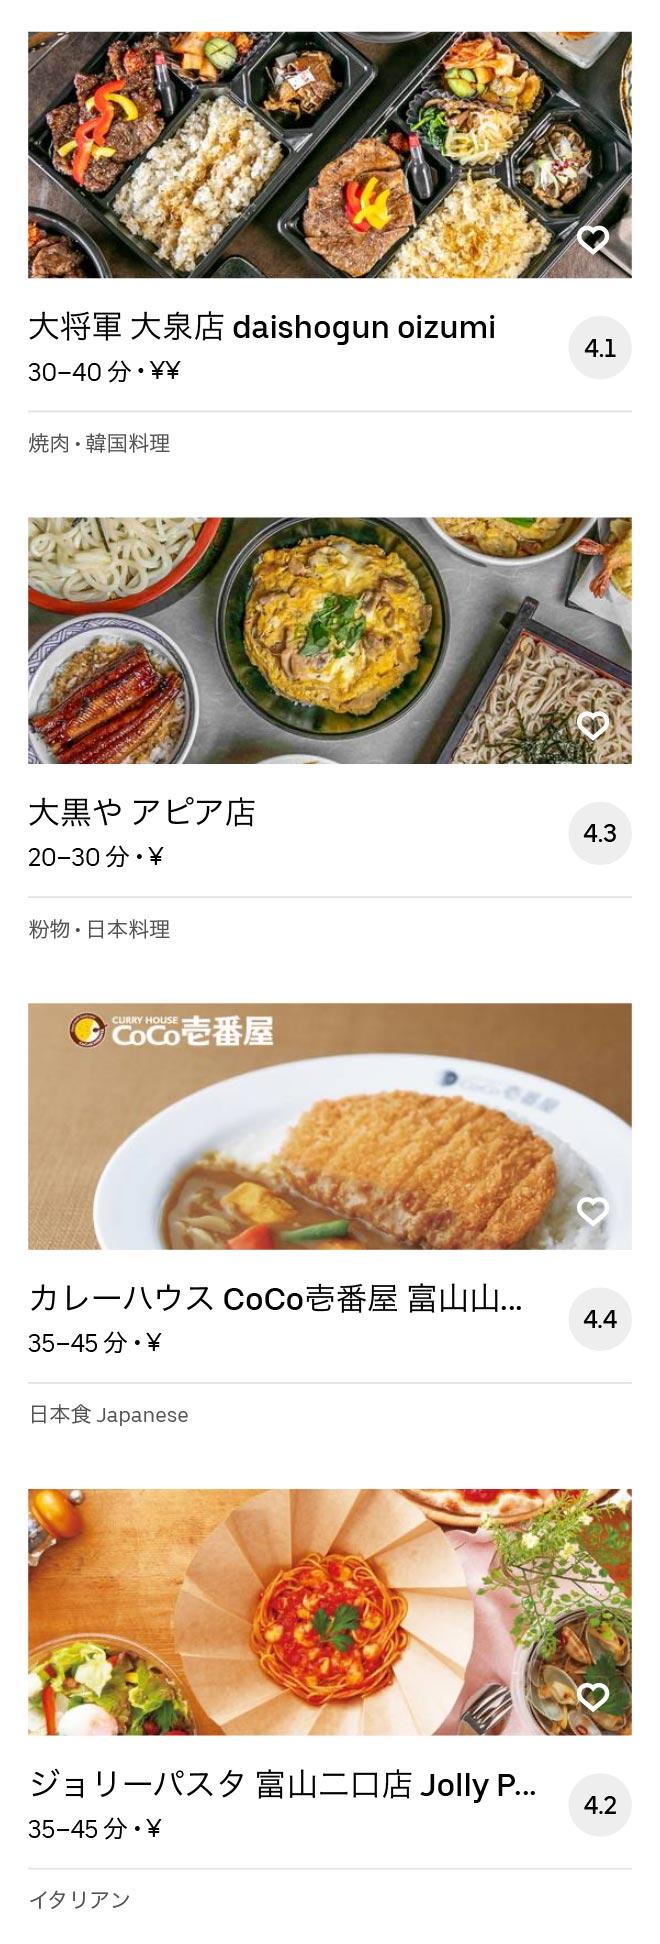 Toyama menu 2009 06